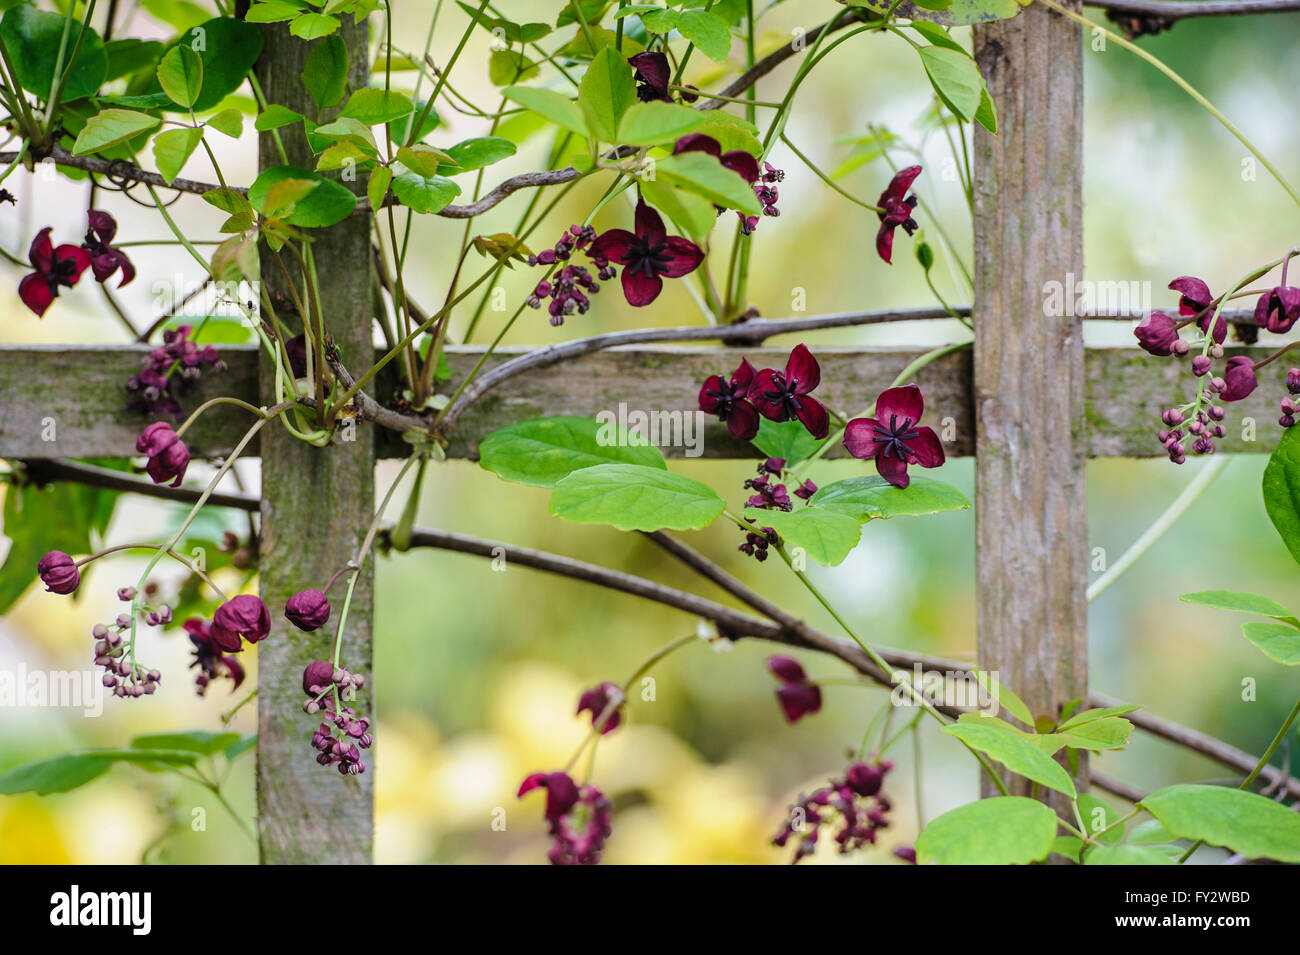 Chocolate Vine Stock Photos & Chocolate Vine Stock Images - Alamy